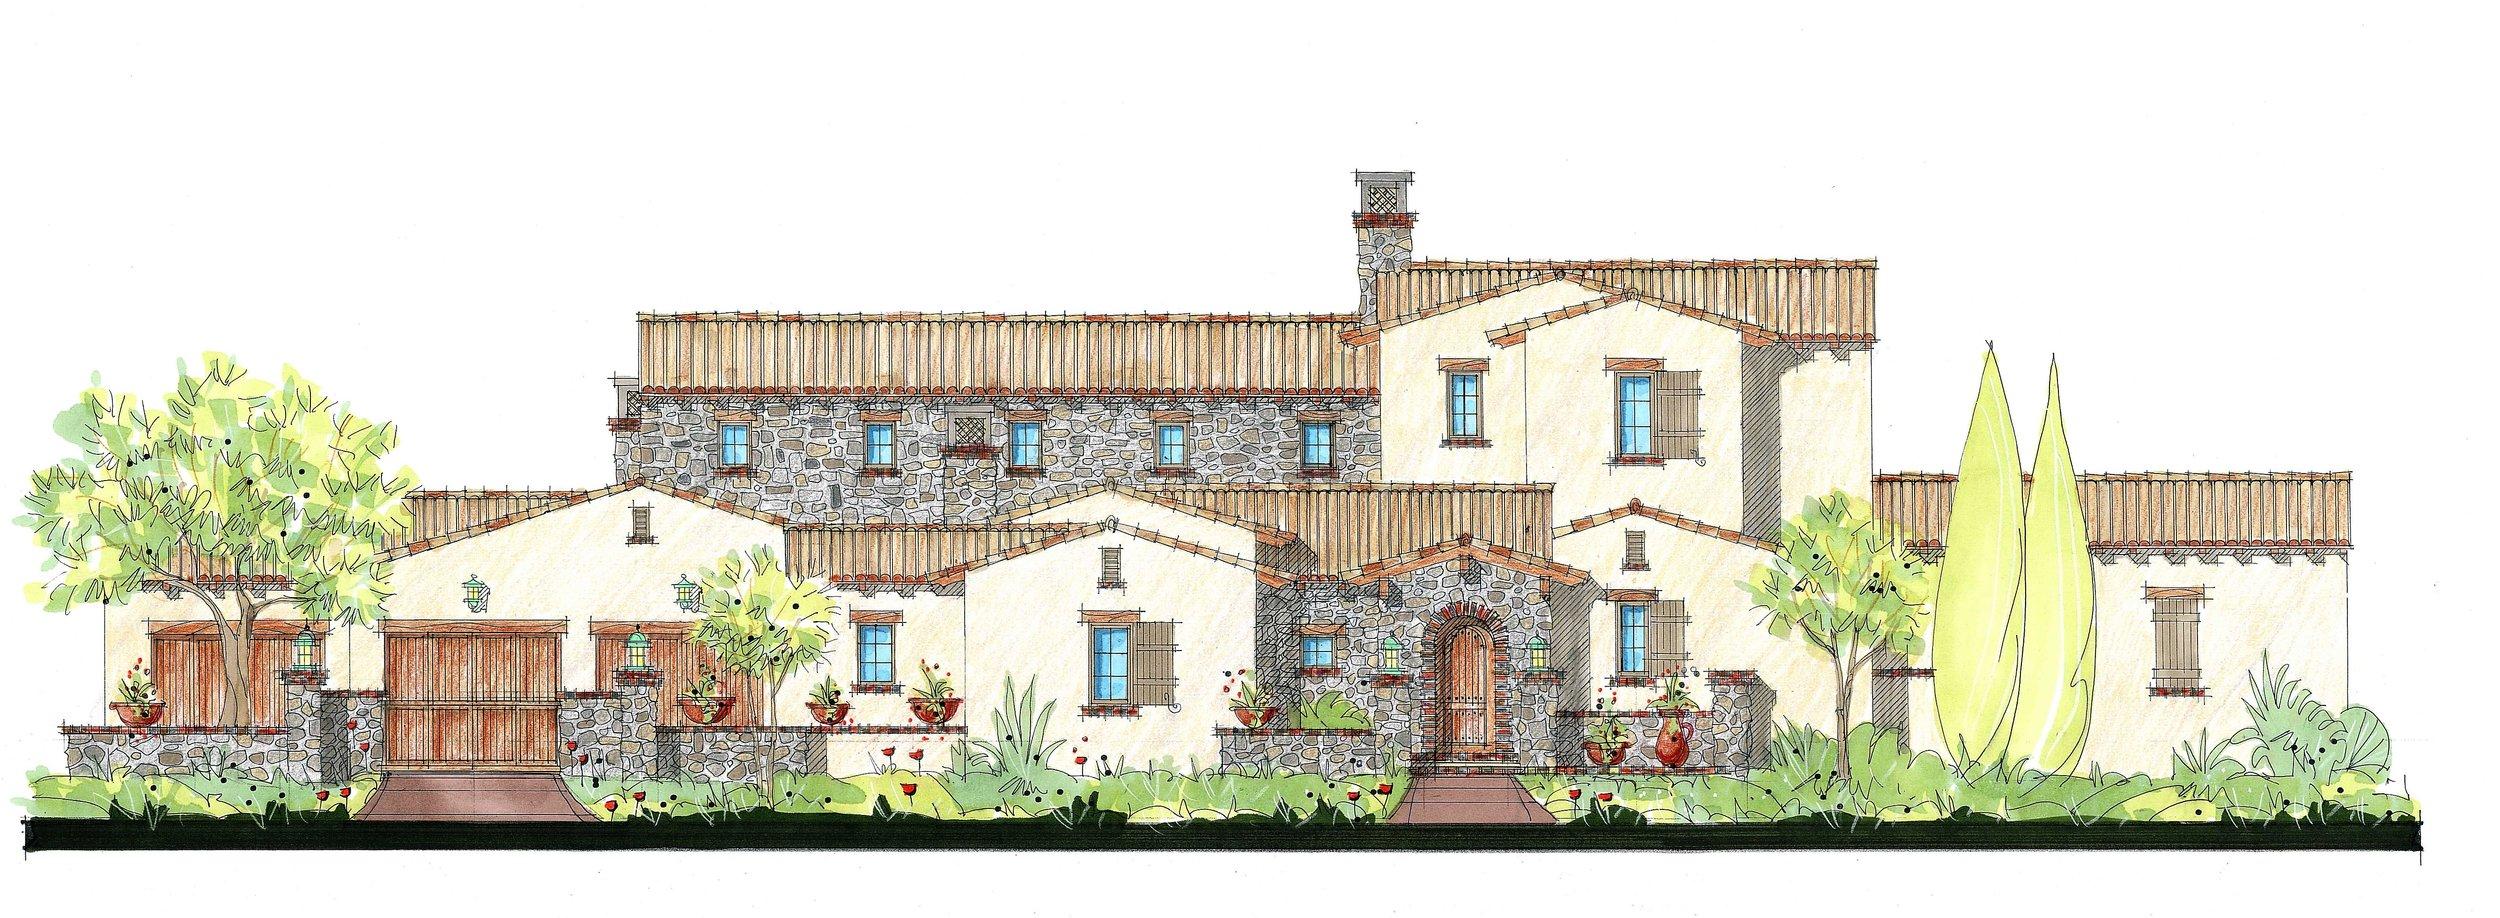 Villa Paradiso 5 bed | 5 & 2- 1/2 bath | 4 car garage 6,961 sq. ft.